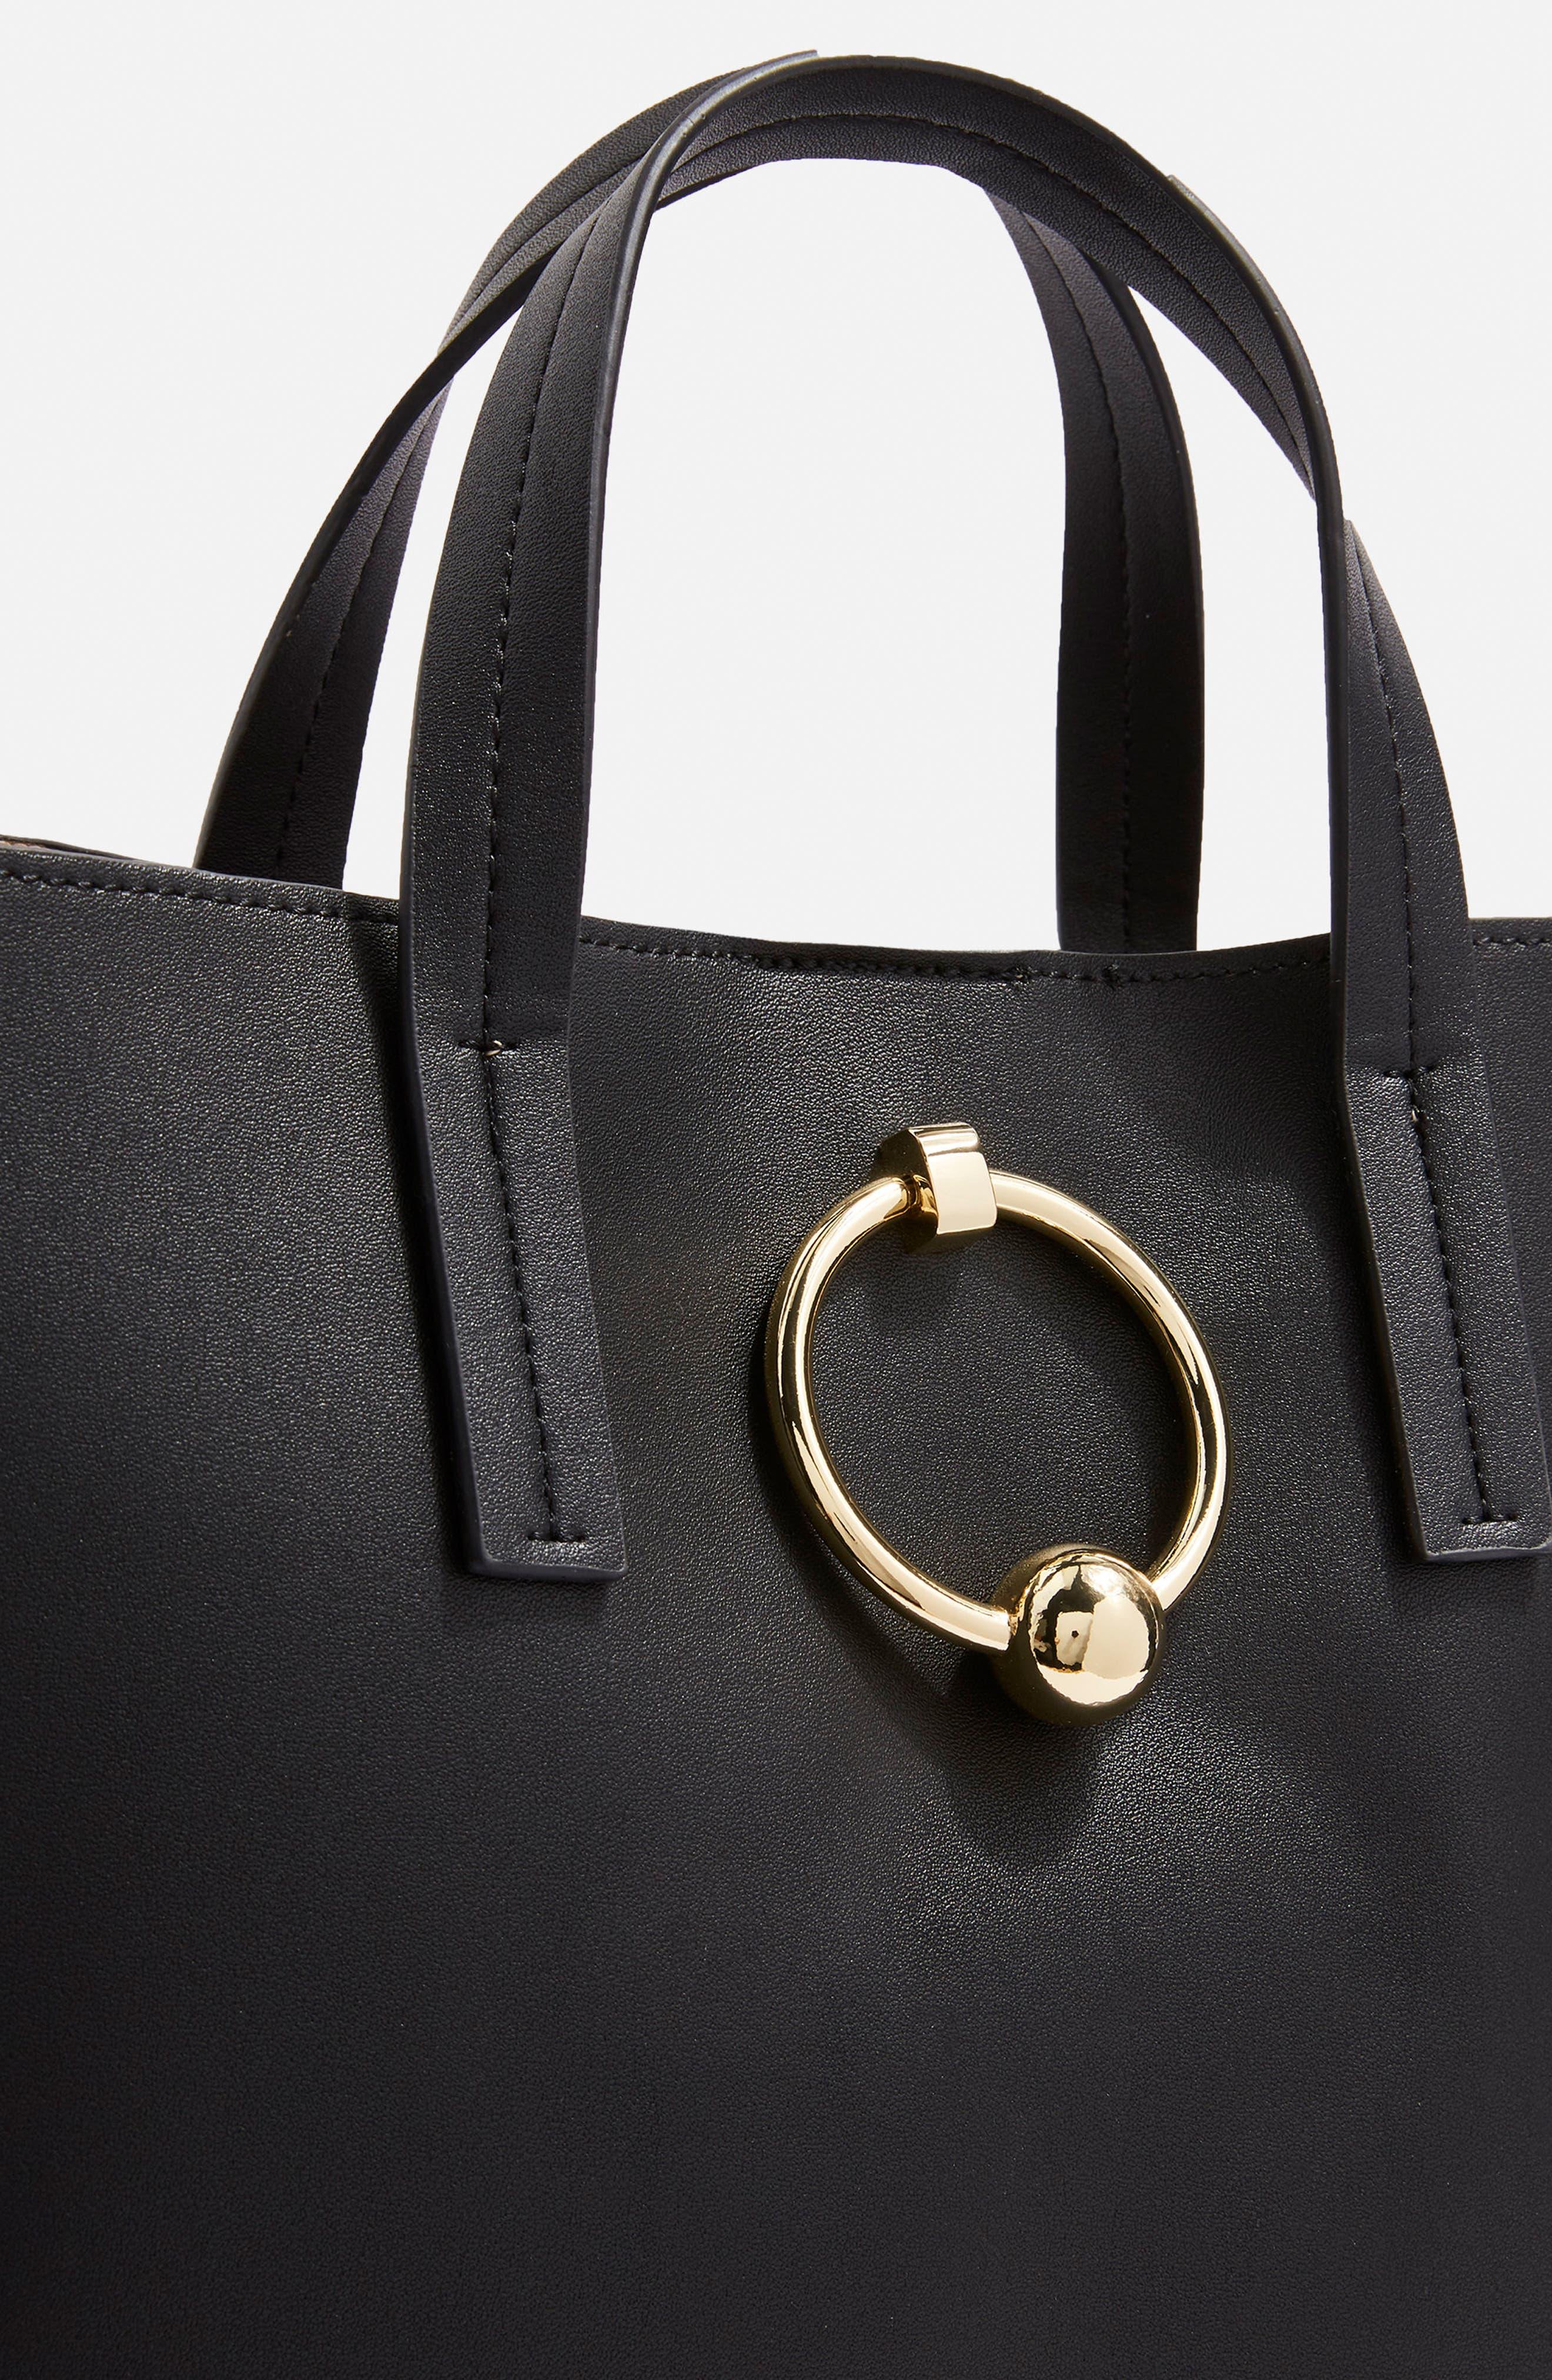 Seline Tote Bag,                             Alternate thumbnail 6, color,                             Black